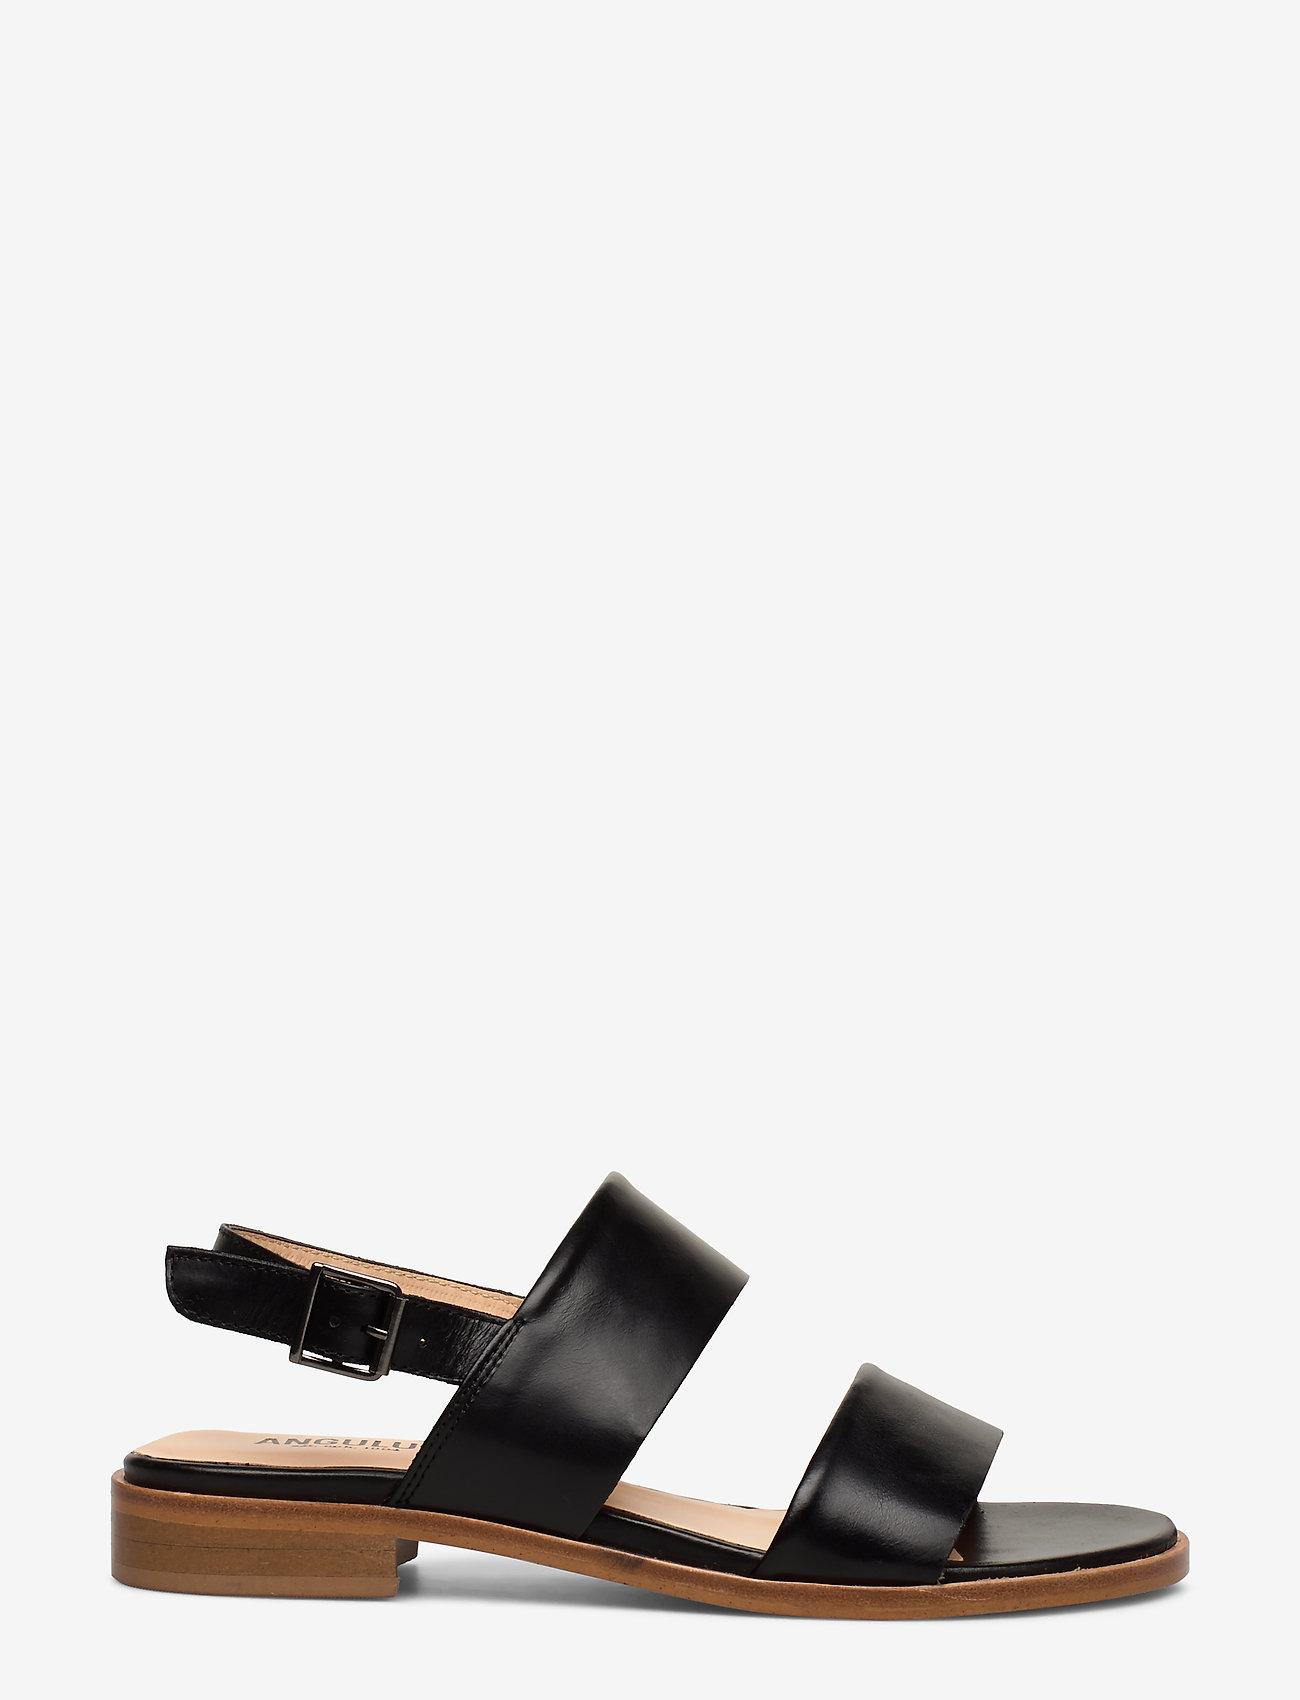 ANGULUS - Sandals - flat - platta sandaler - 1835 black - 1